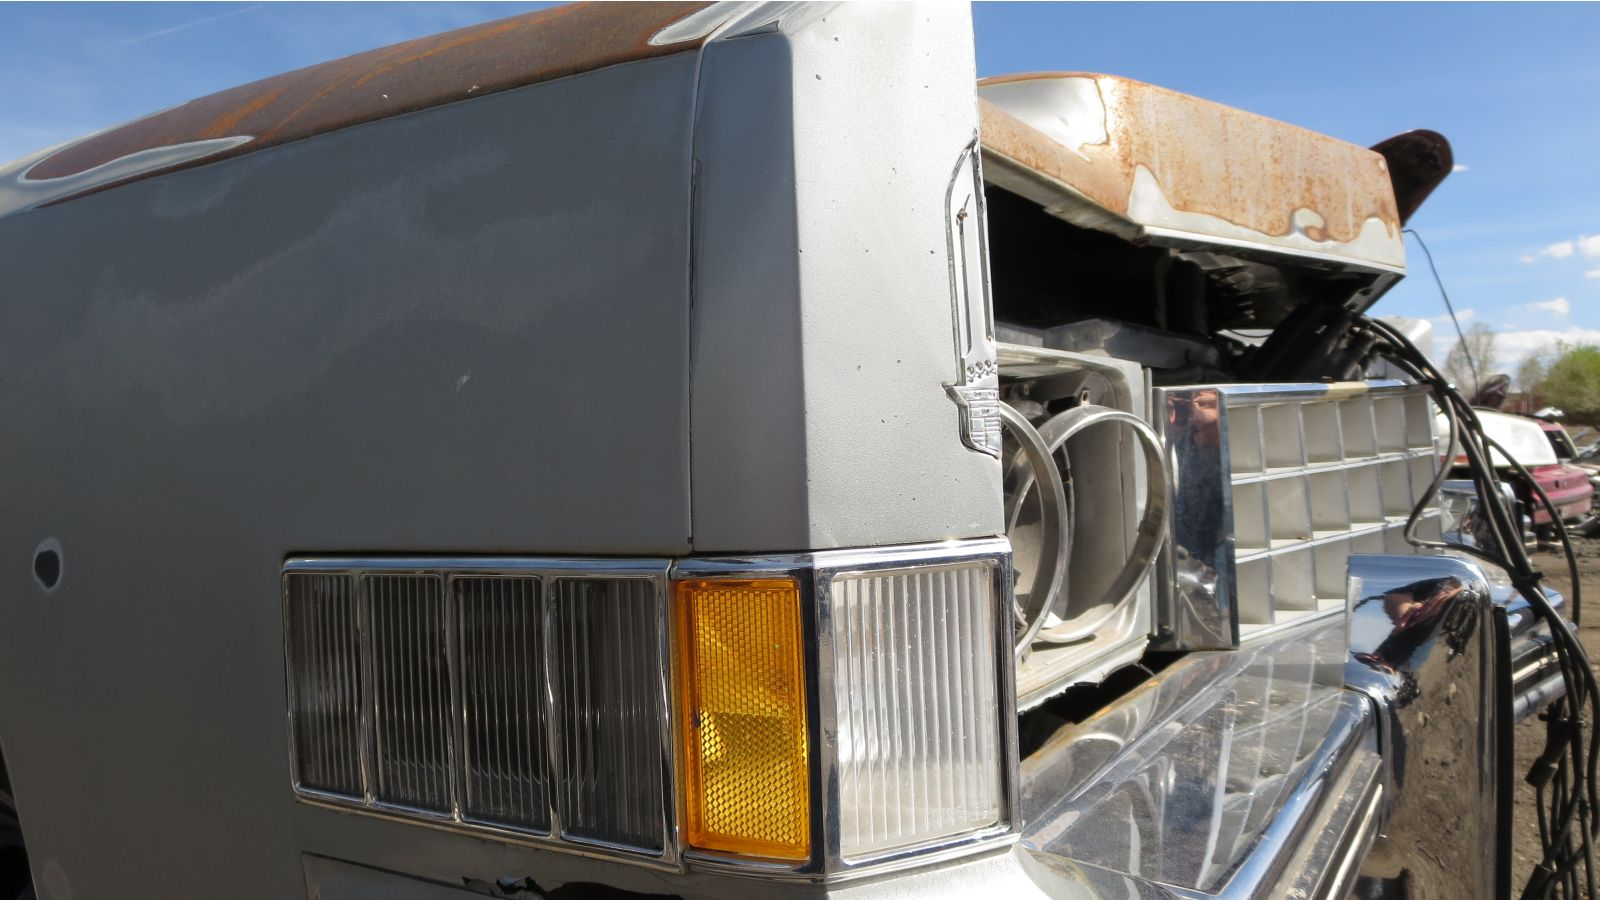 1973 Cadillac Eldorado in Denver Junkyard